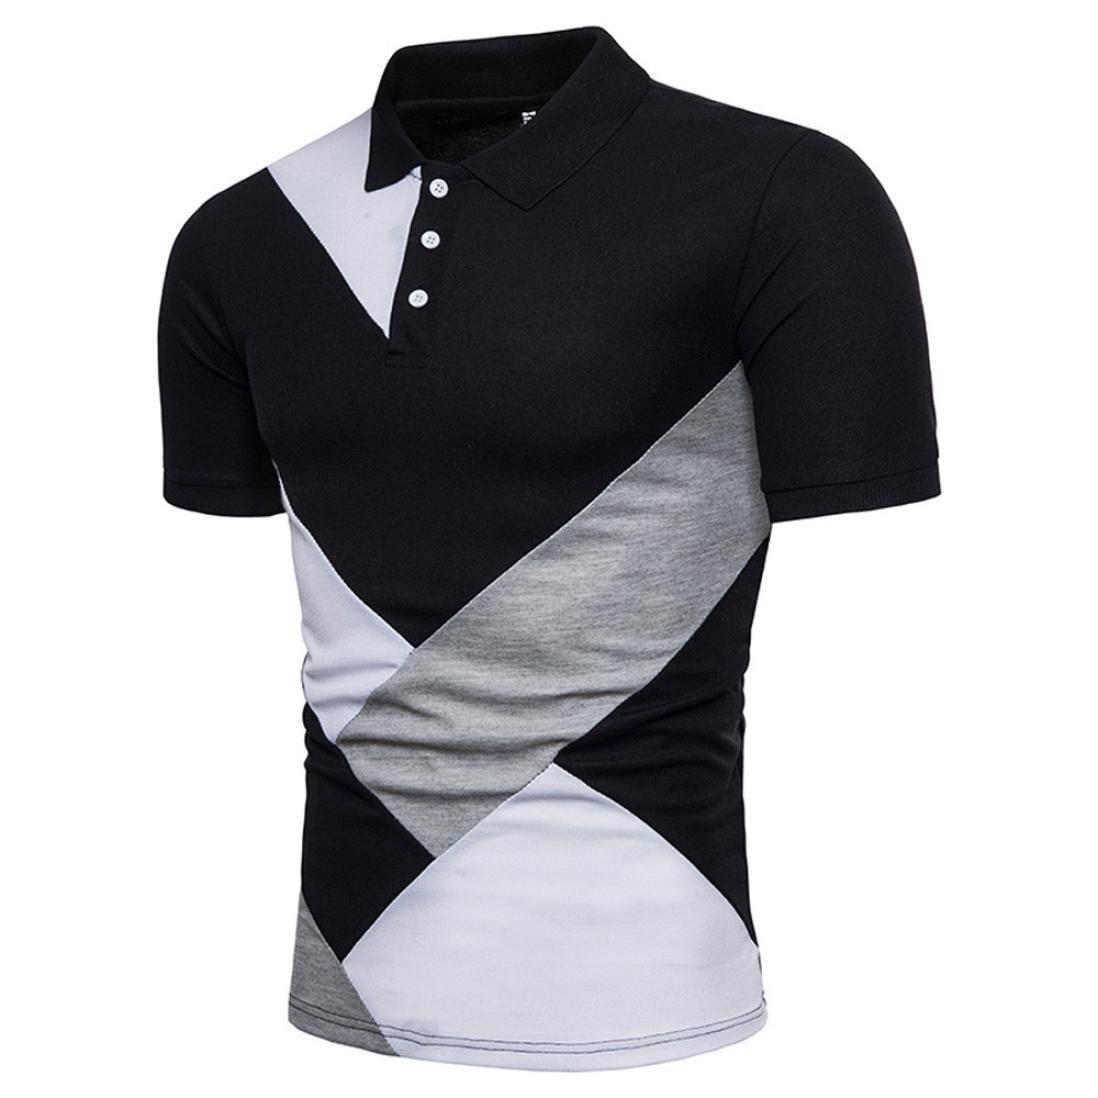 NEEKEY Mens T Shirts Men Printing Tees Shirt Short Sleeve T Shirt Blouse Tops